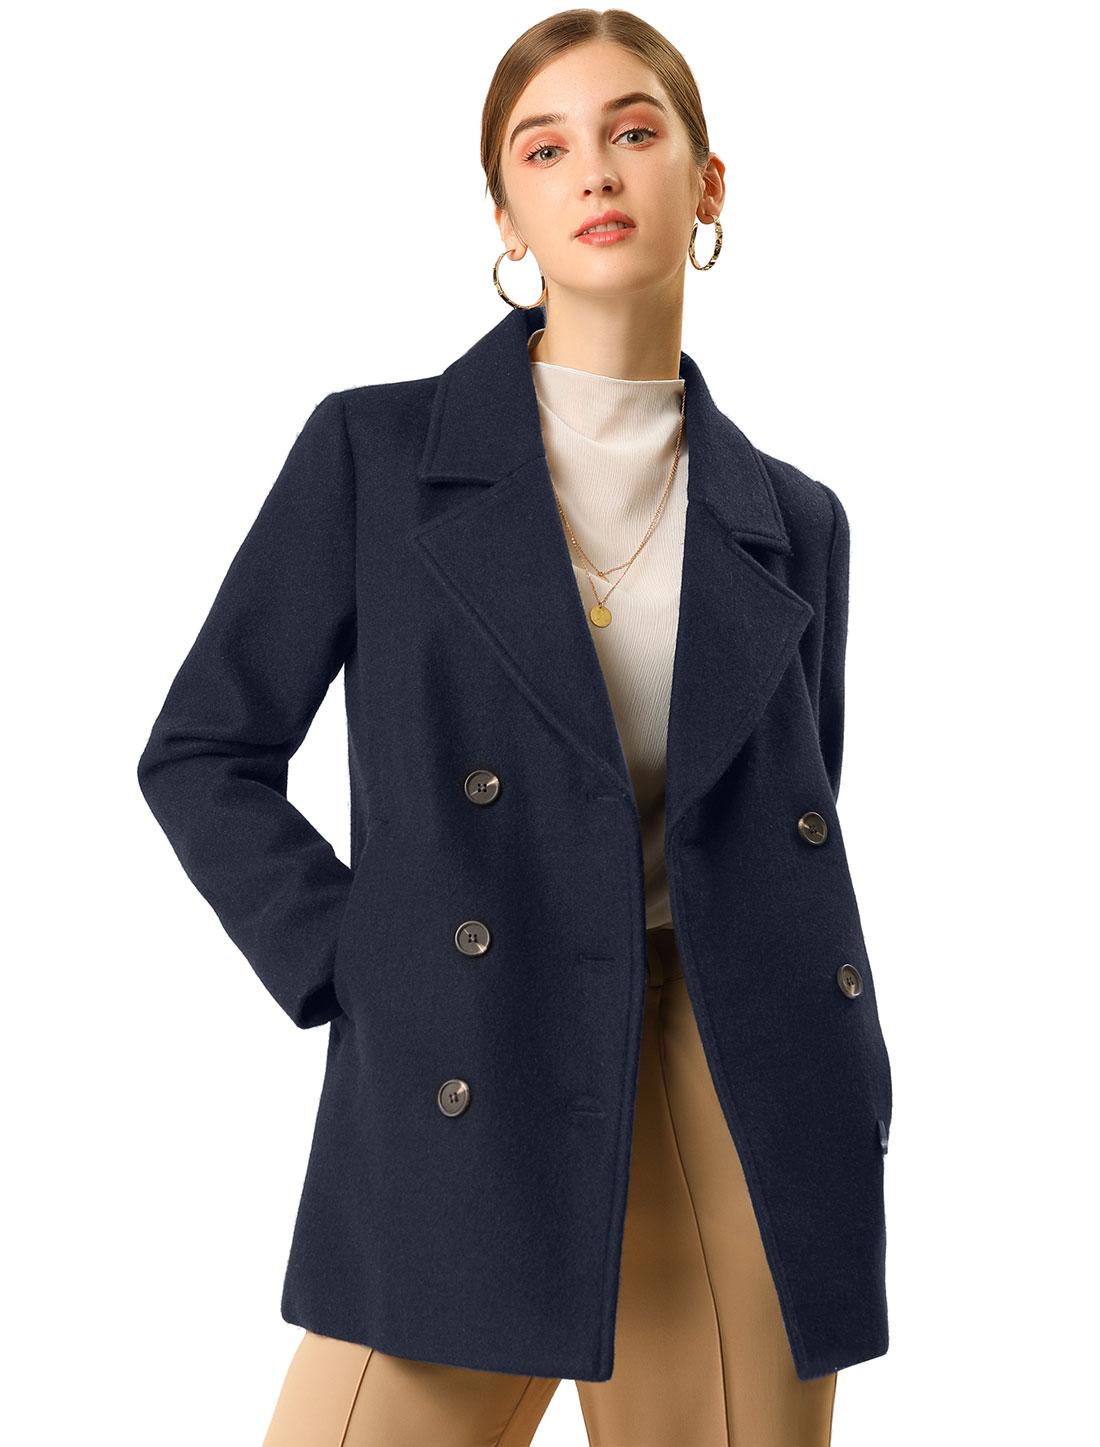 Women's Double Breast Notched Lapel Pocket Mid Thigh Felt Coat Dark Navy Blue XS